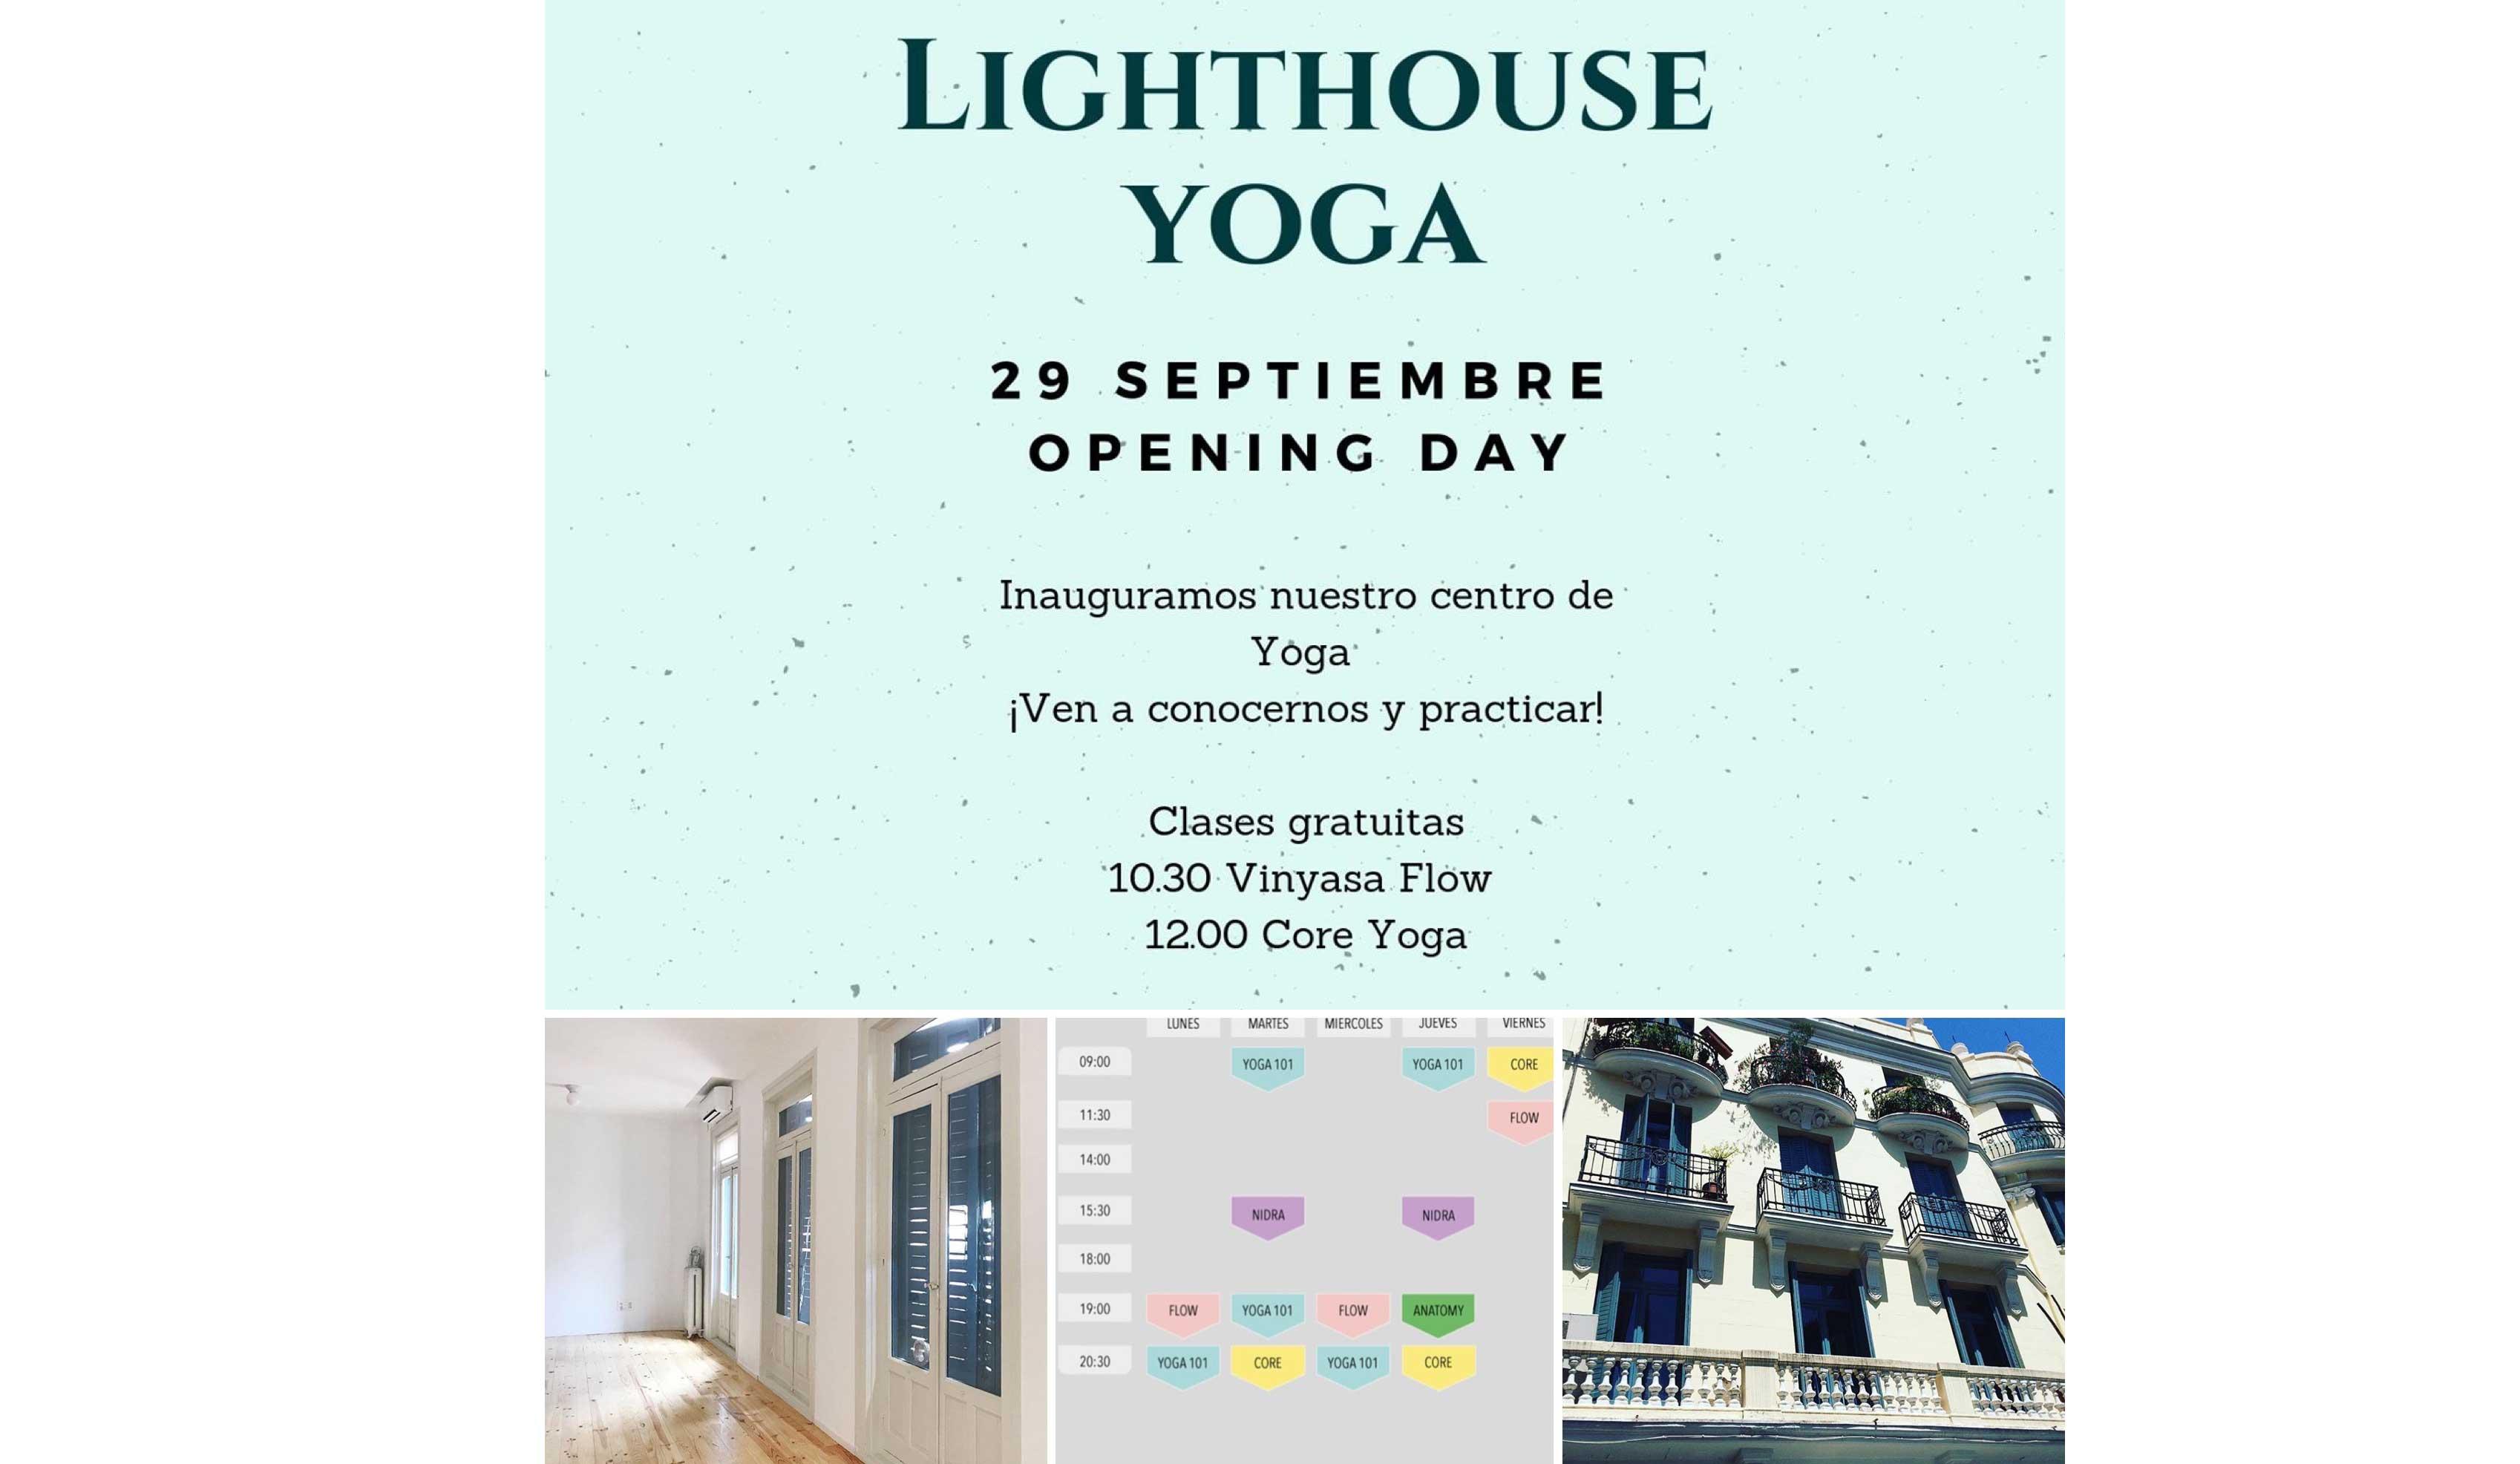 LightHouse Yoga, nuevo centro en Madrid